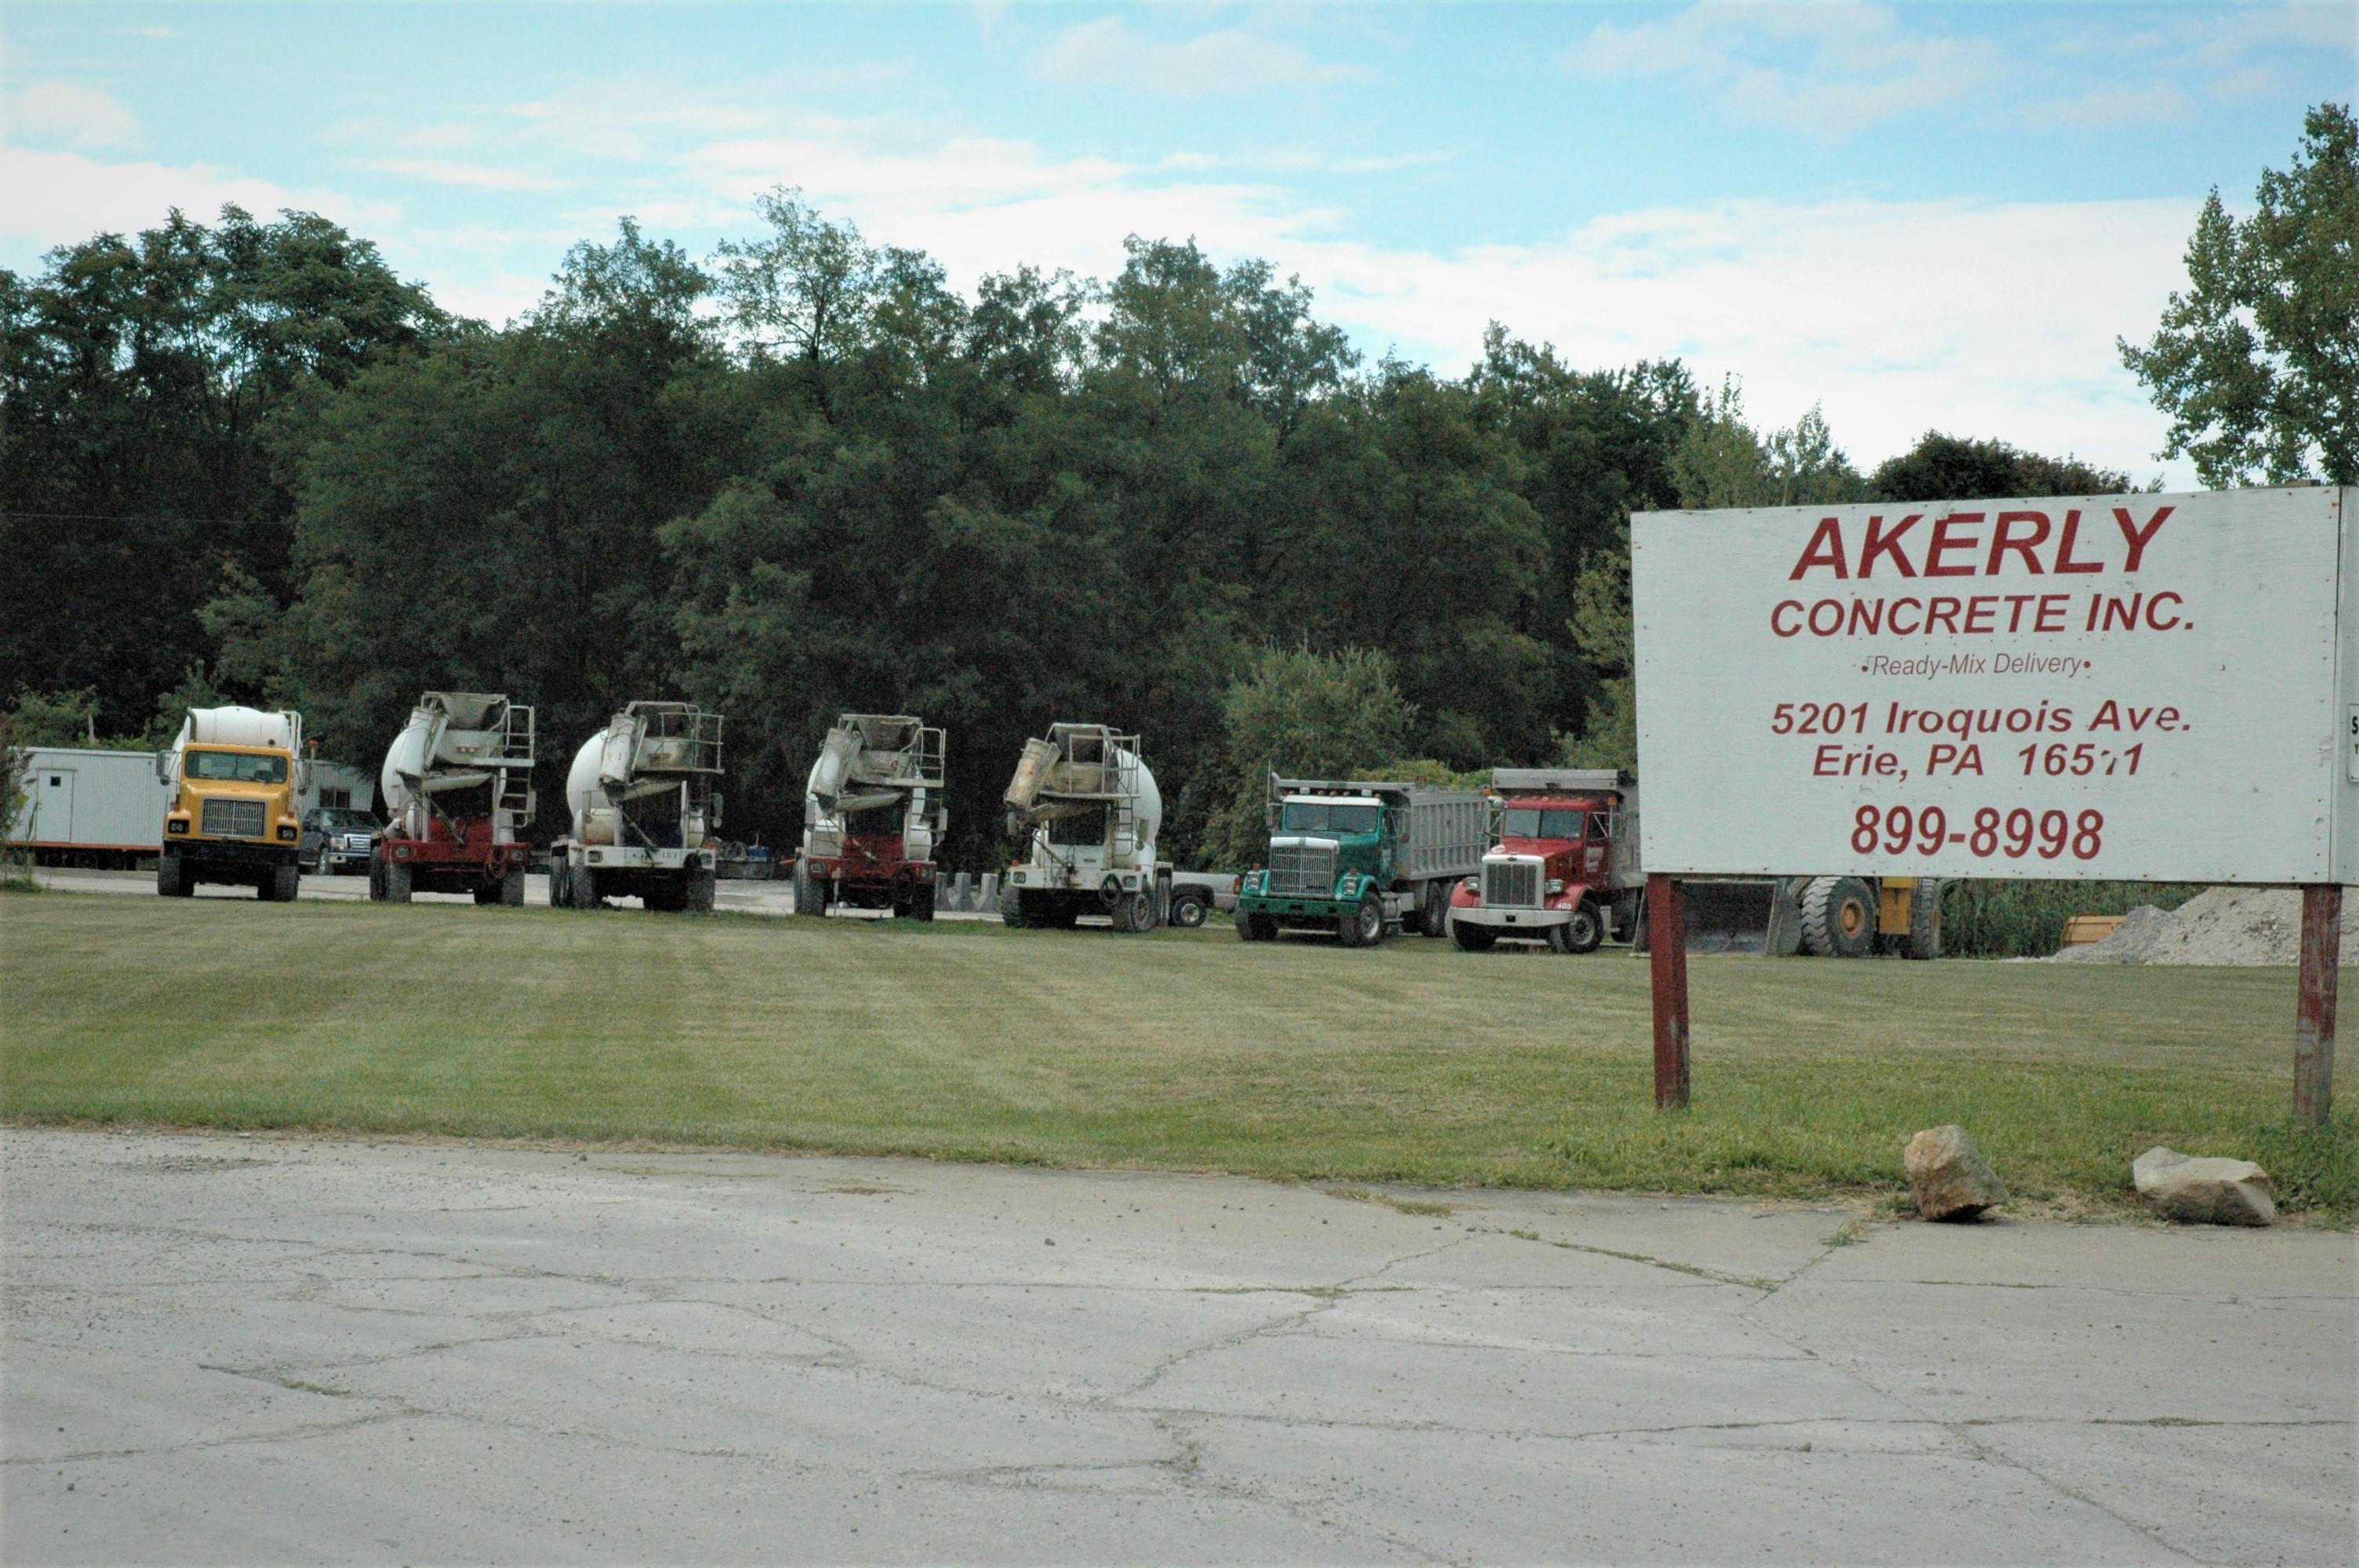 Akerly Concrete, Inc. image 7